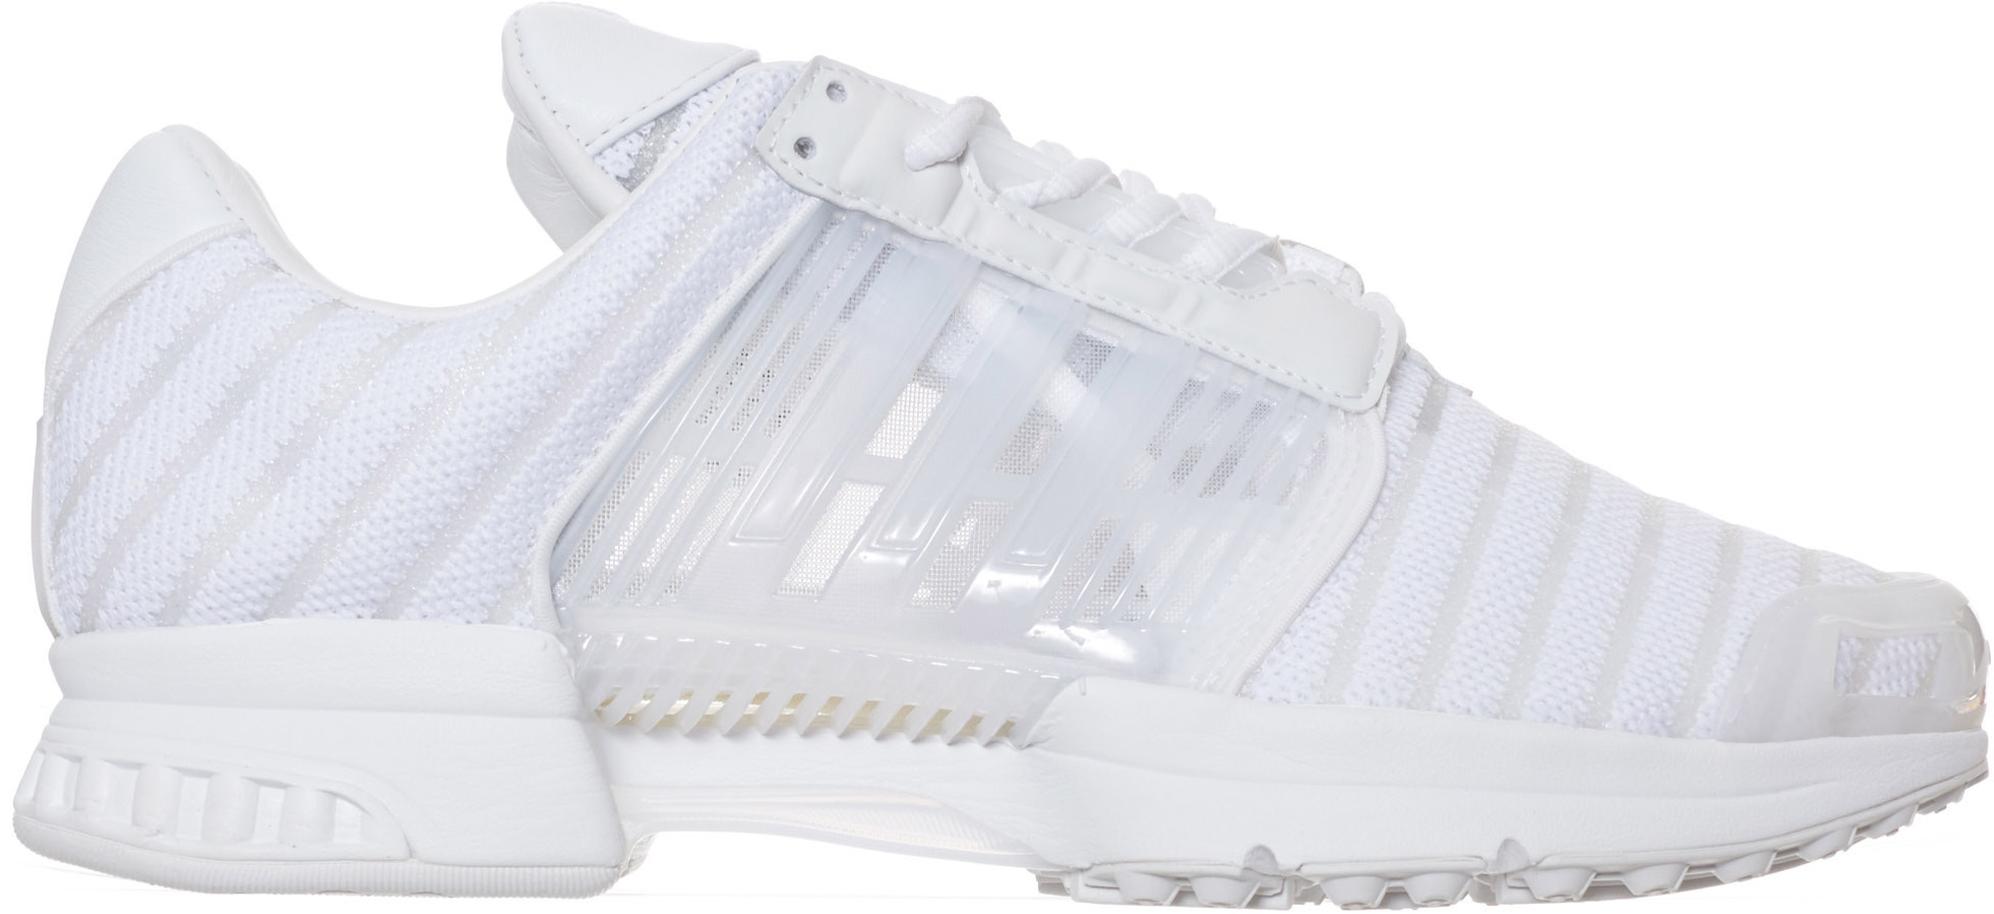 adidas Climacool Wish Sneakerboy Jellyfish